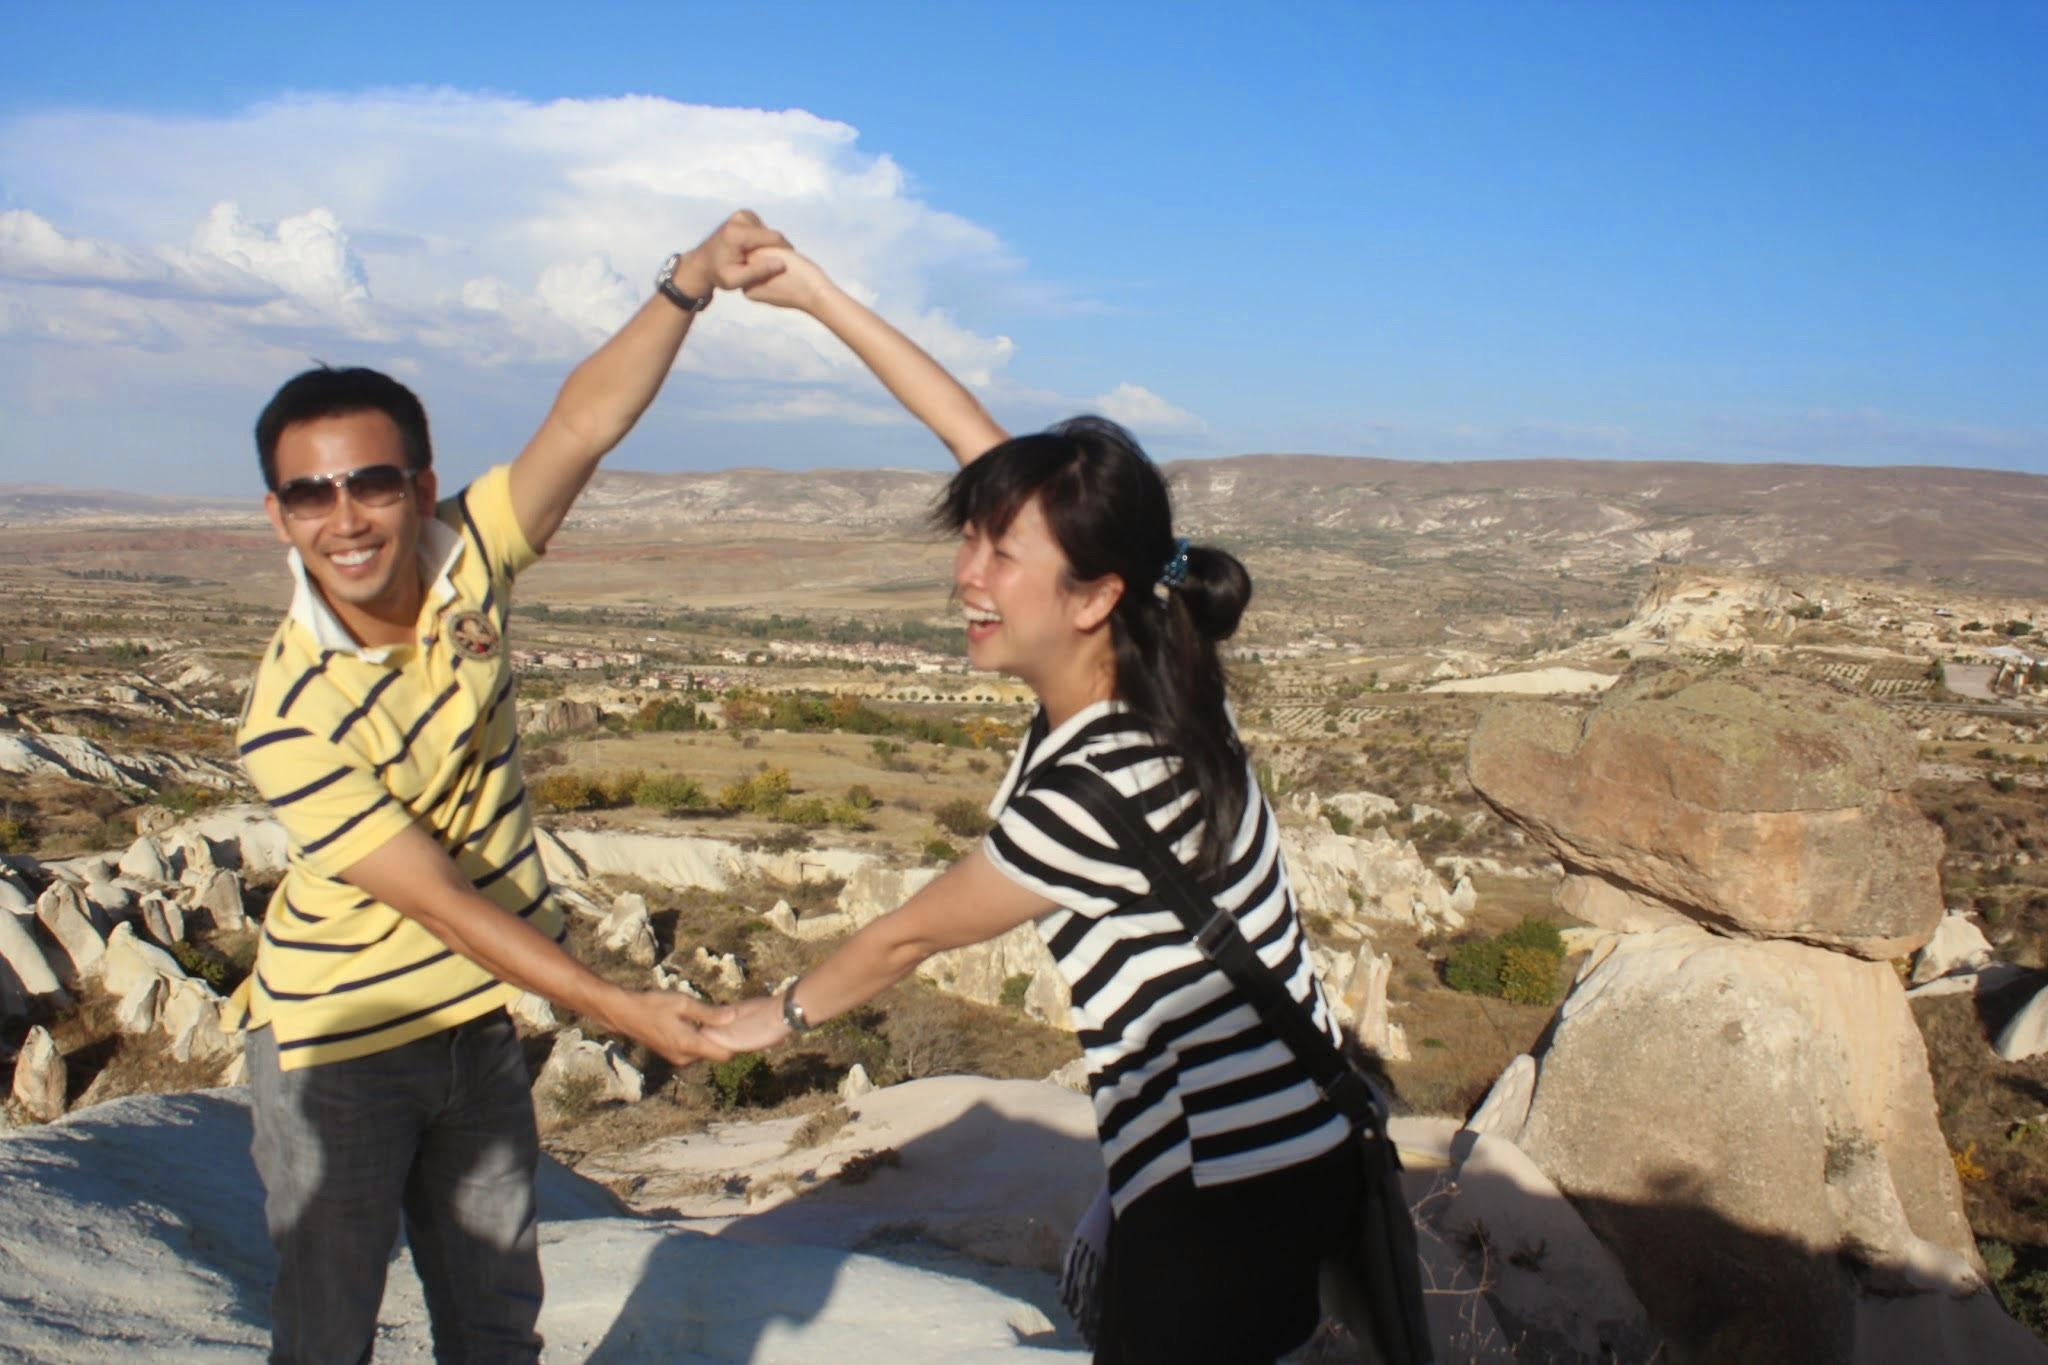 Happy Together by Meriç Aksu